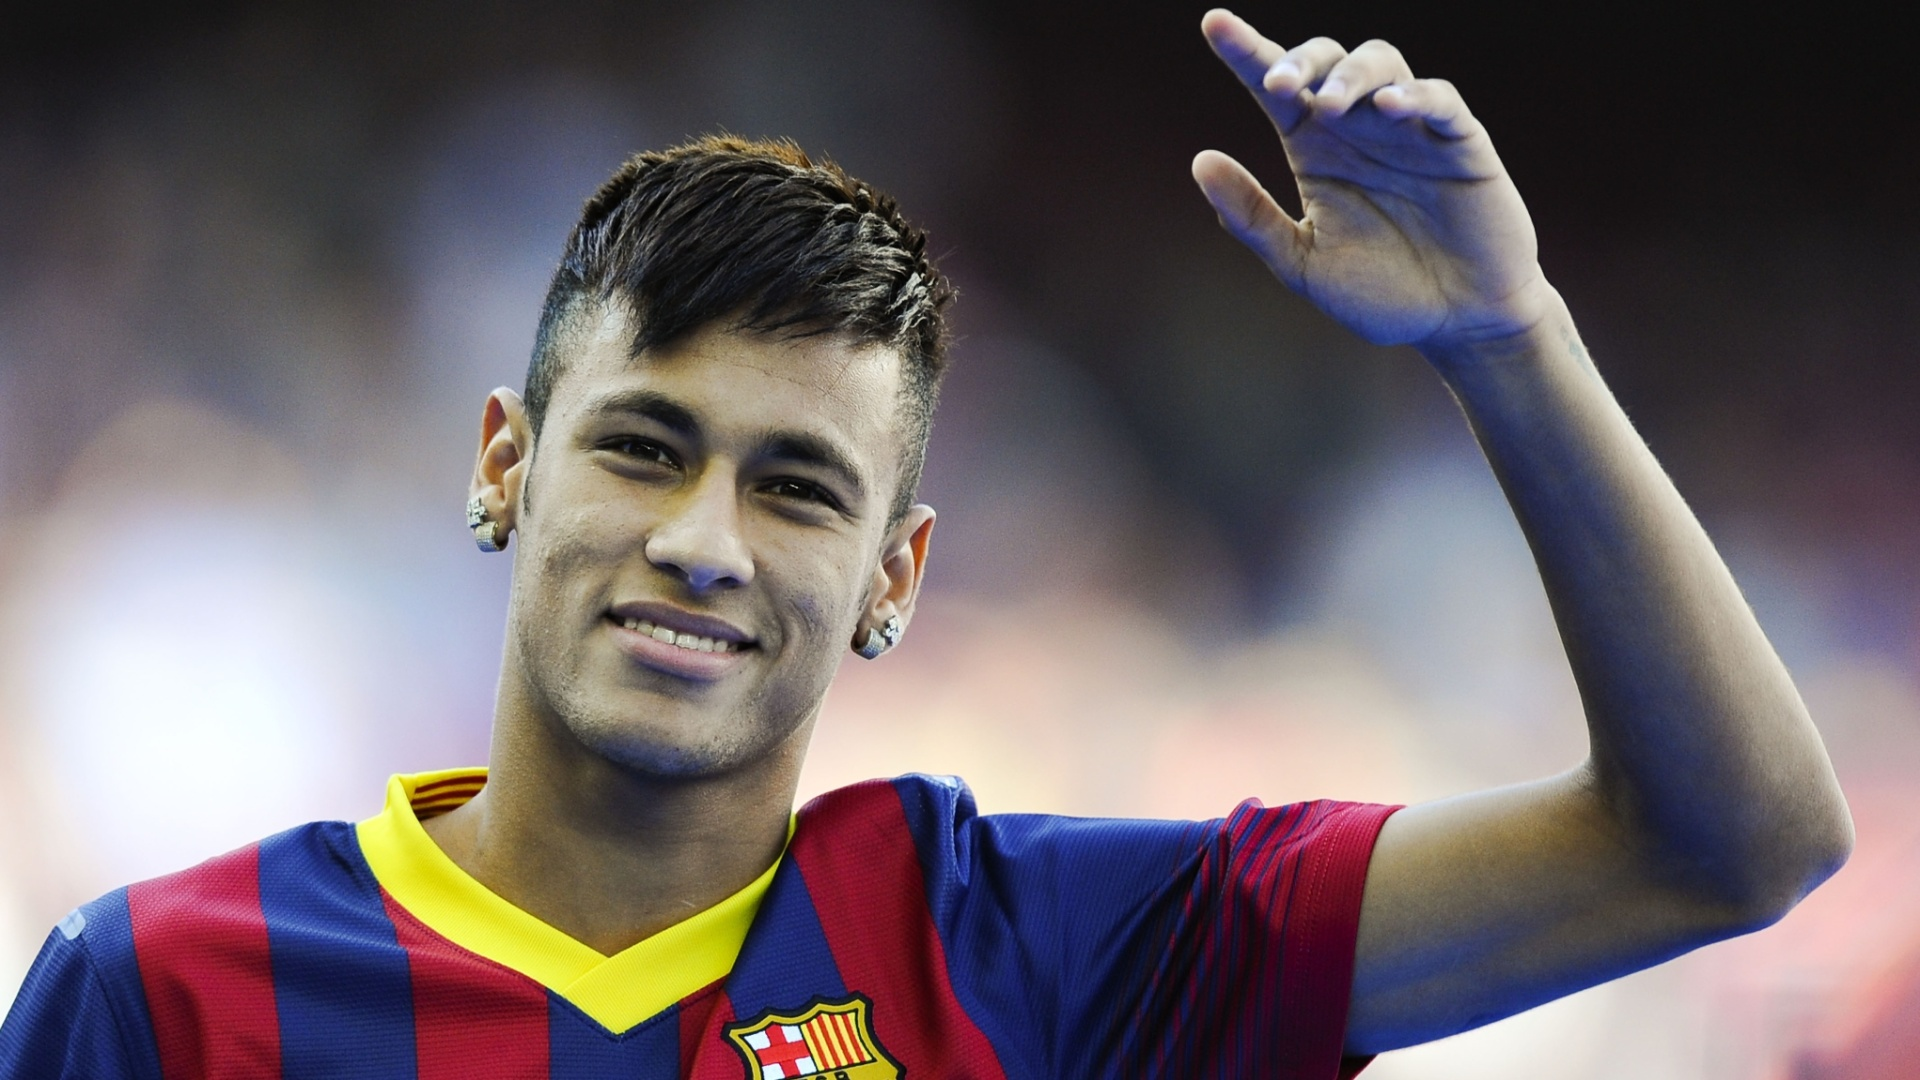 Neymar the next talent like Messi and Ronaldo – Sir Alex Ferguson